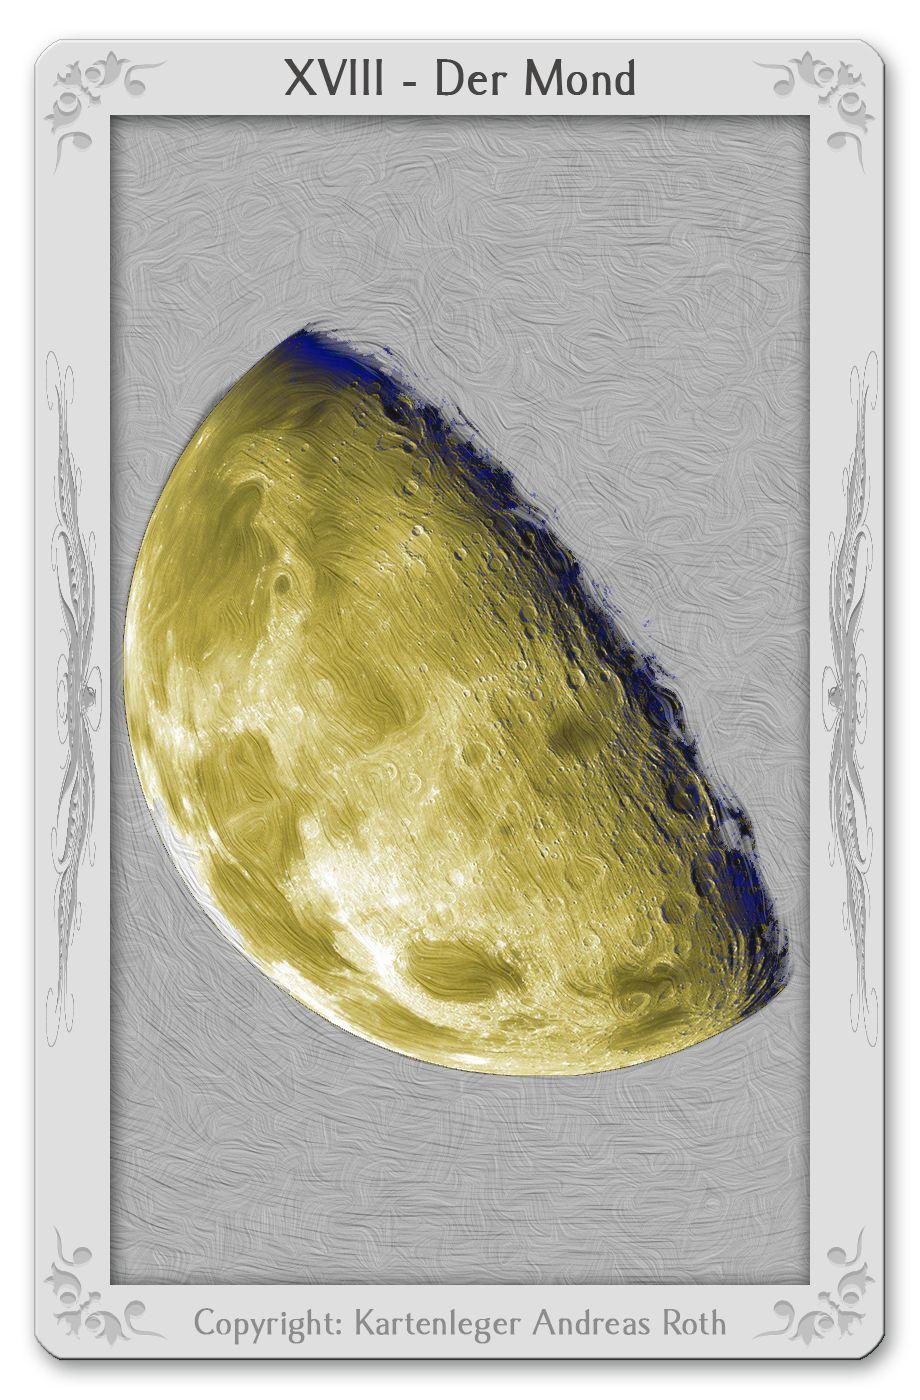 Tarotkarte Der Mond: Bedeutung, Kombinationen, Deutung